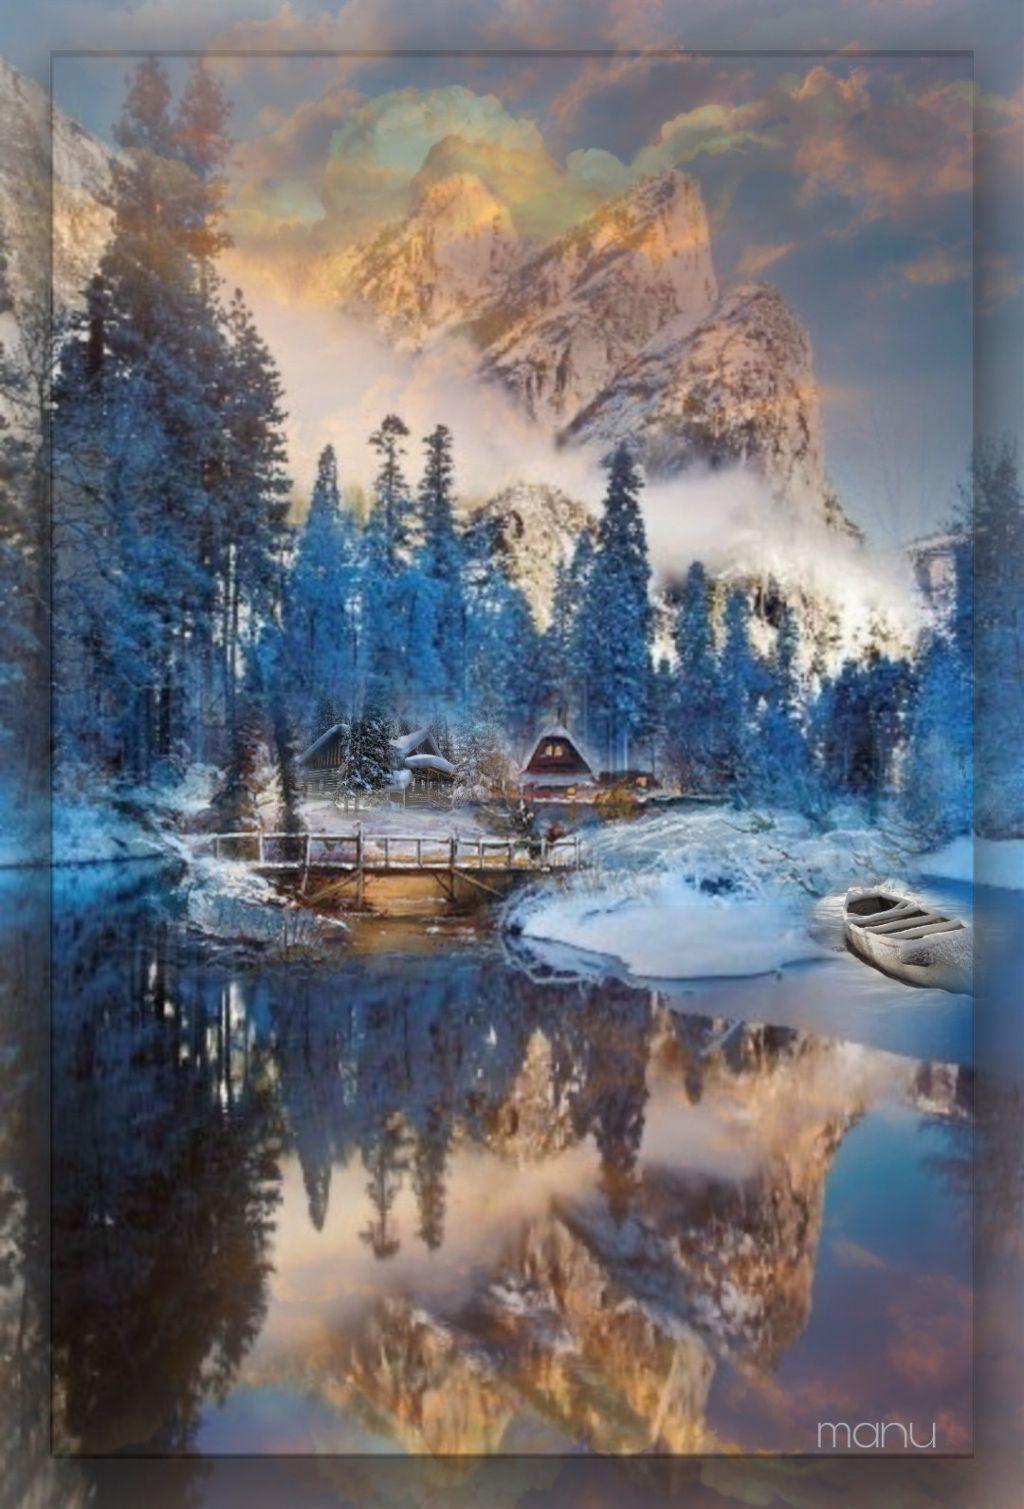 #freetoedit #myedit #landscape #winter #sky #doubleexposure #reflexex #mountains #country #boat #fantasy #imagination #